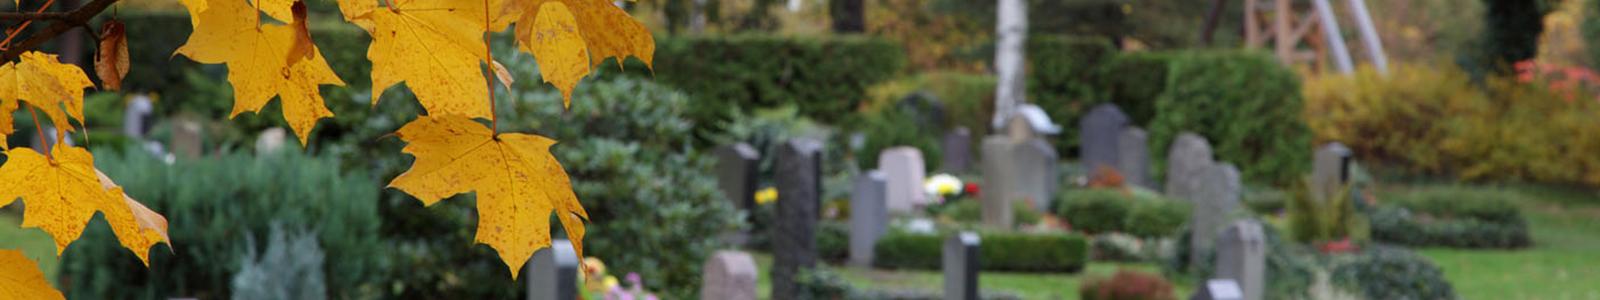 Friedhofsverwaltung Sophienkirchgemeinde